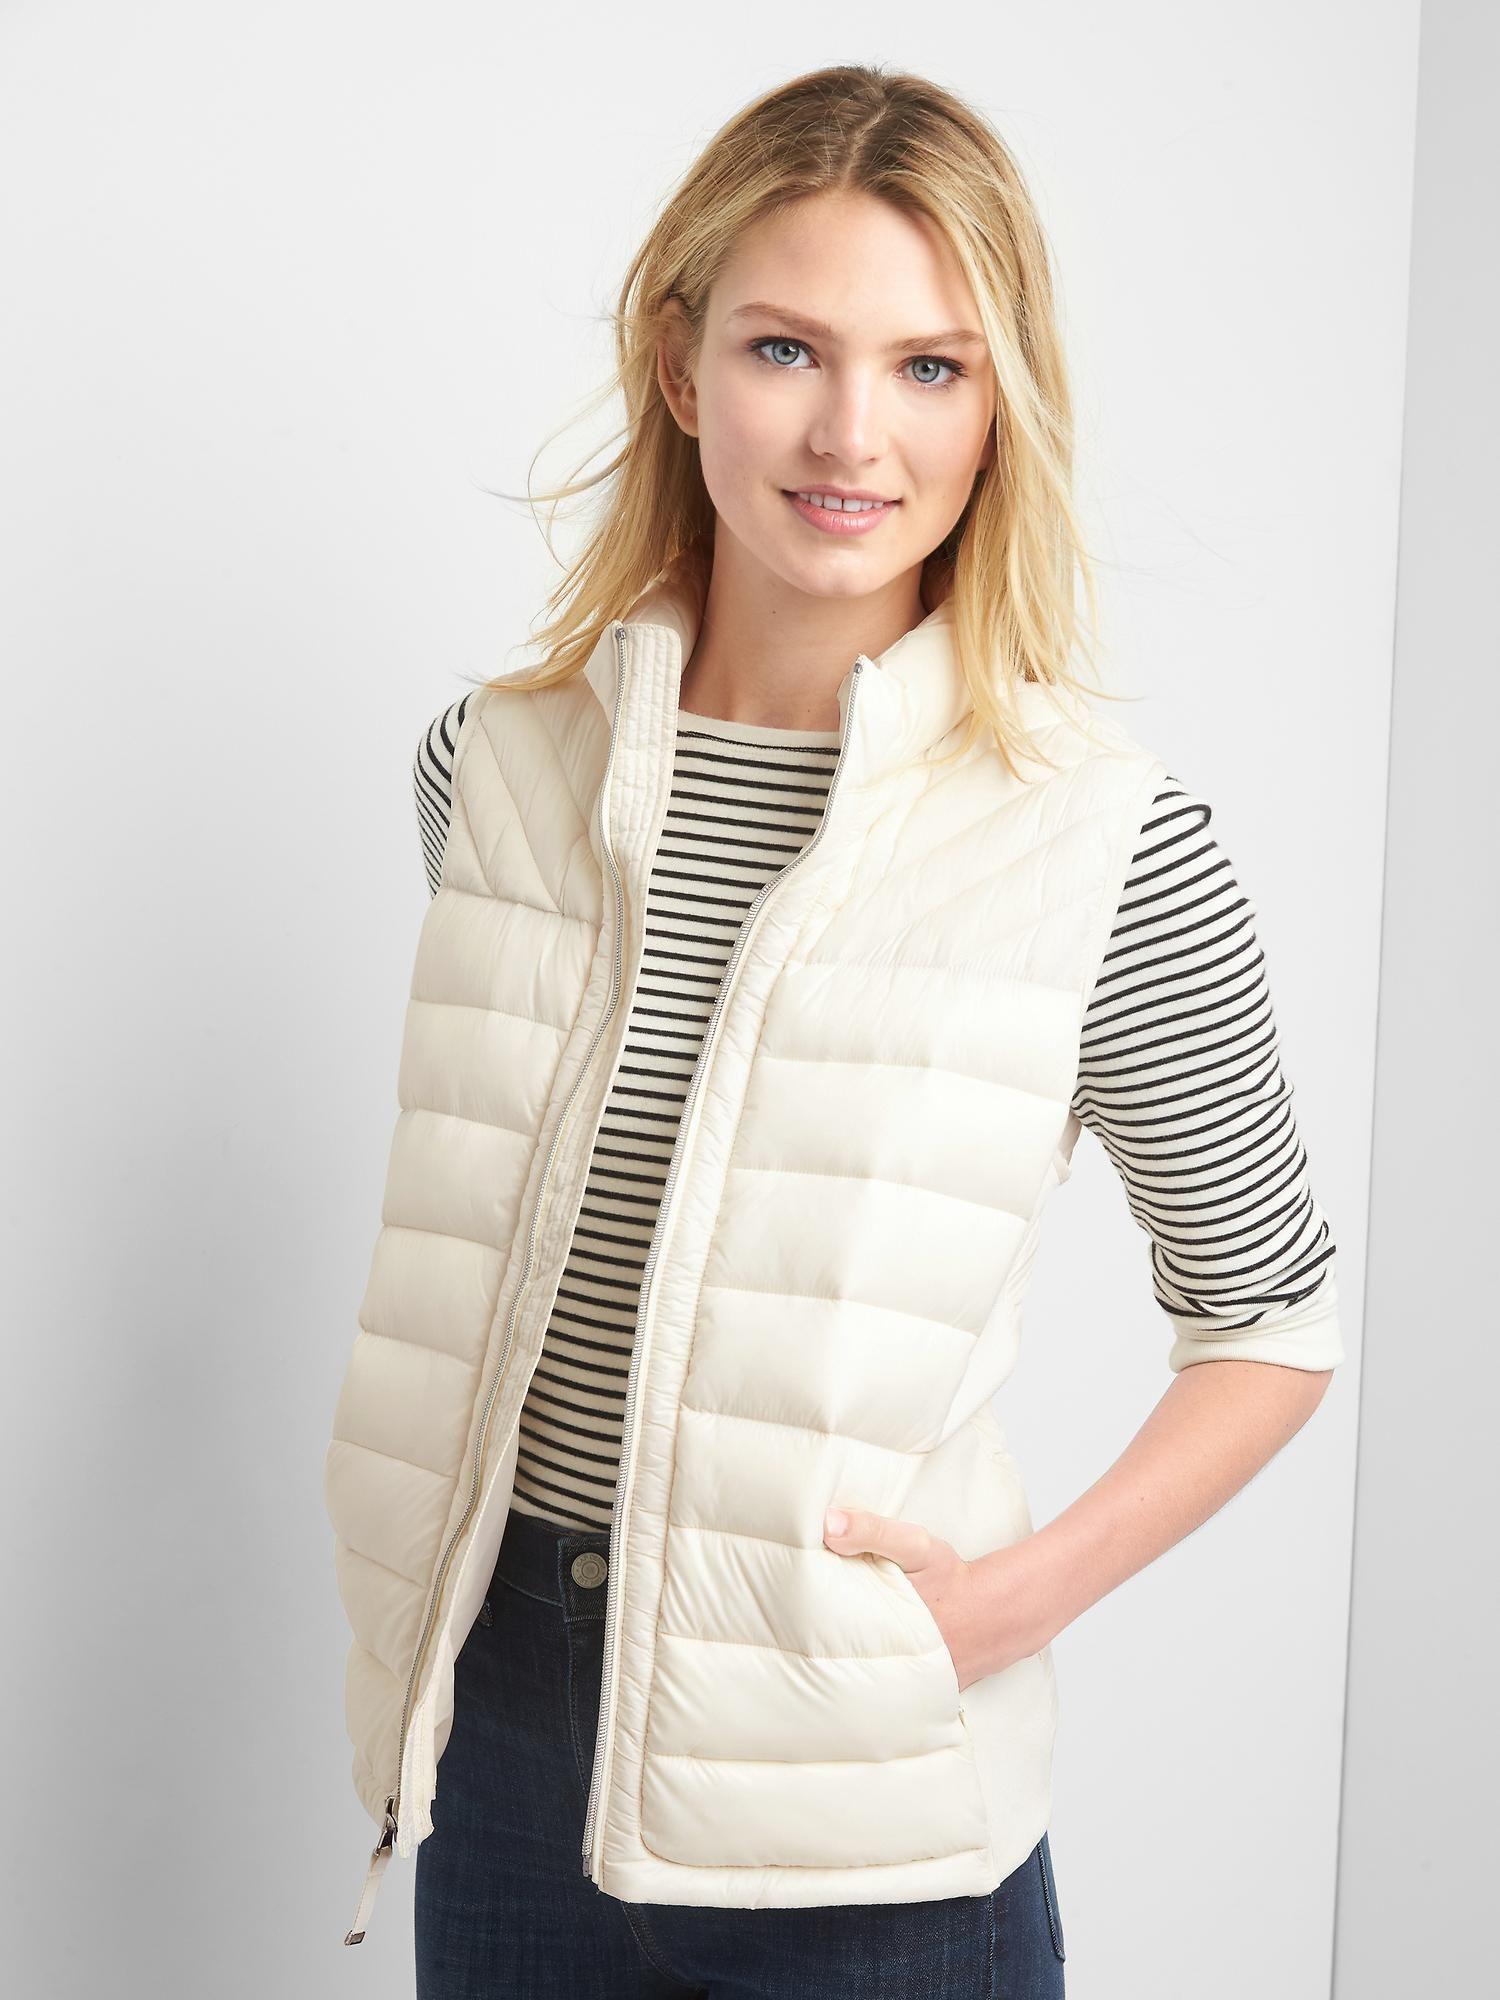 Coldcontrol Lite Puffer Vest Gap Womens White Puffer Vest Coats Jackets Women Gap Outfits [ 2000 x 1500 Pixel ]